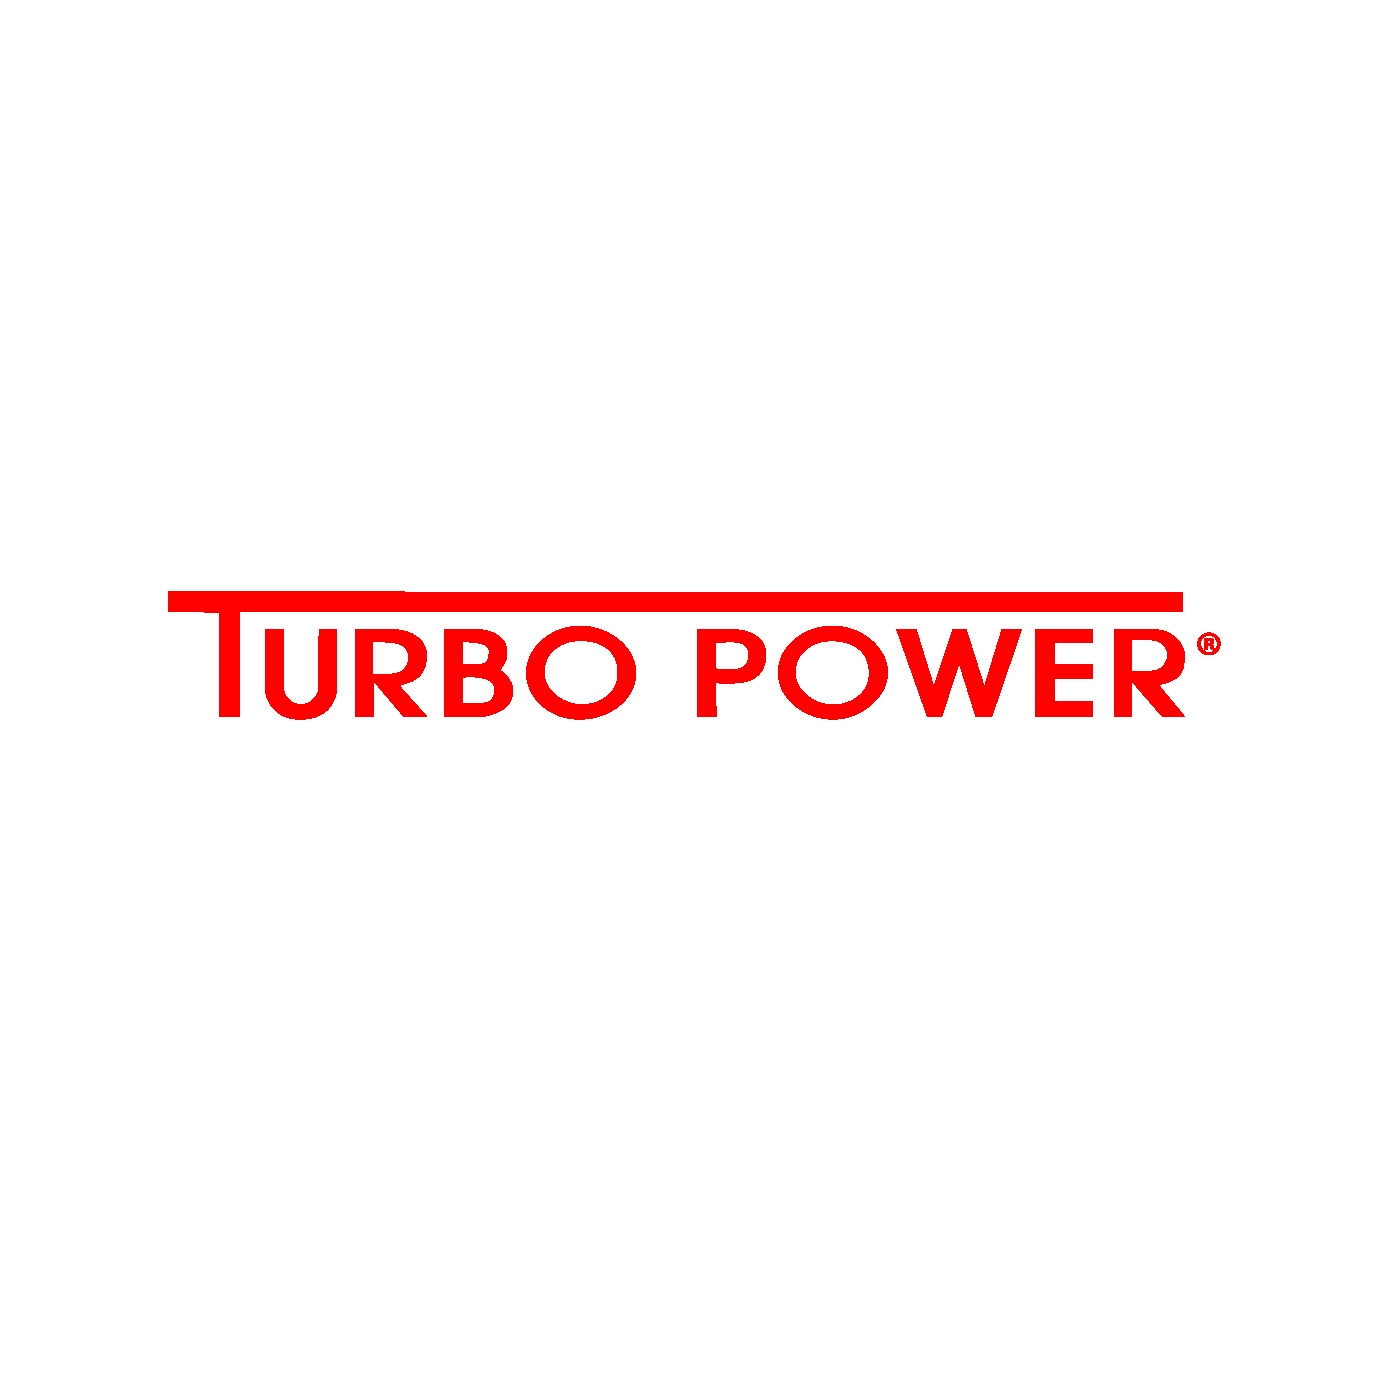 Turbo Power Hair Dryers